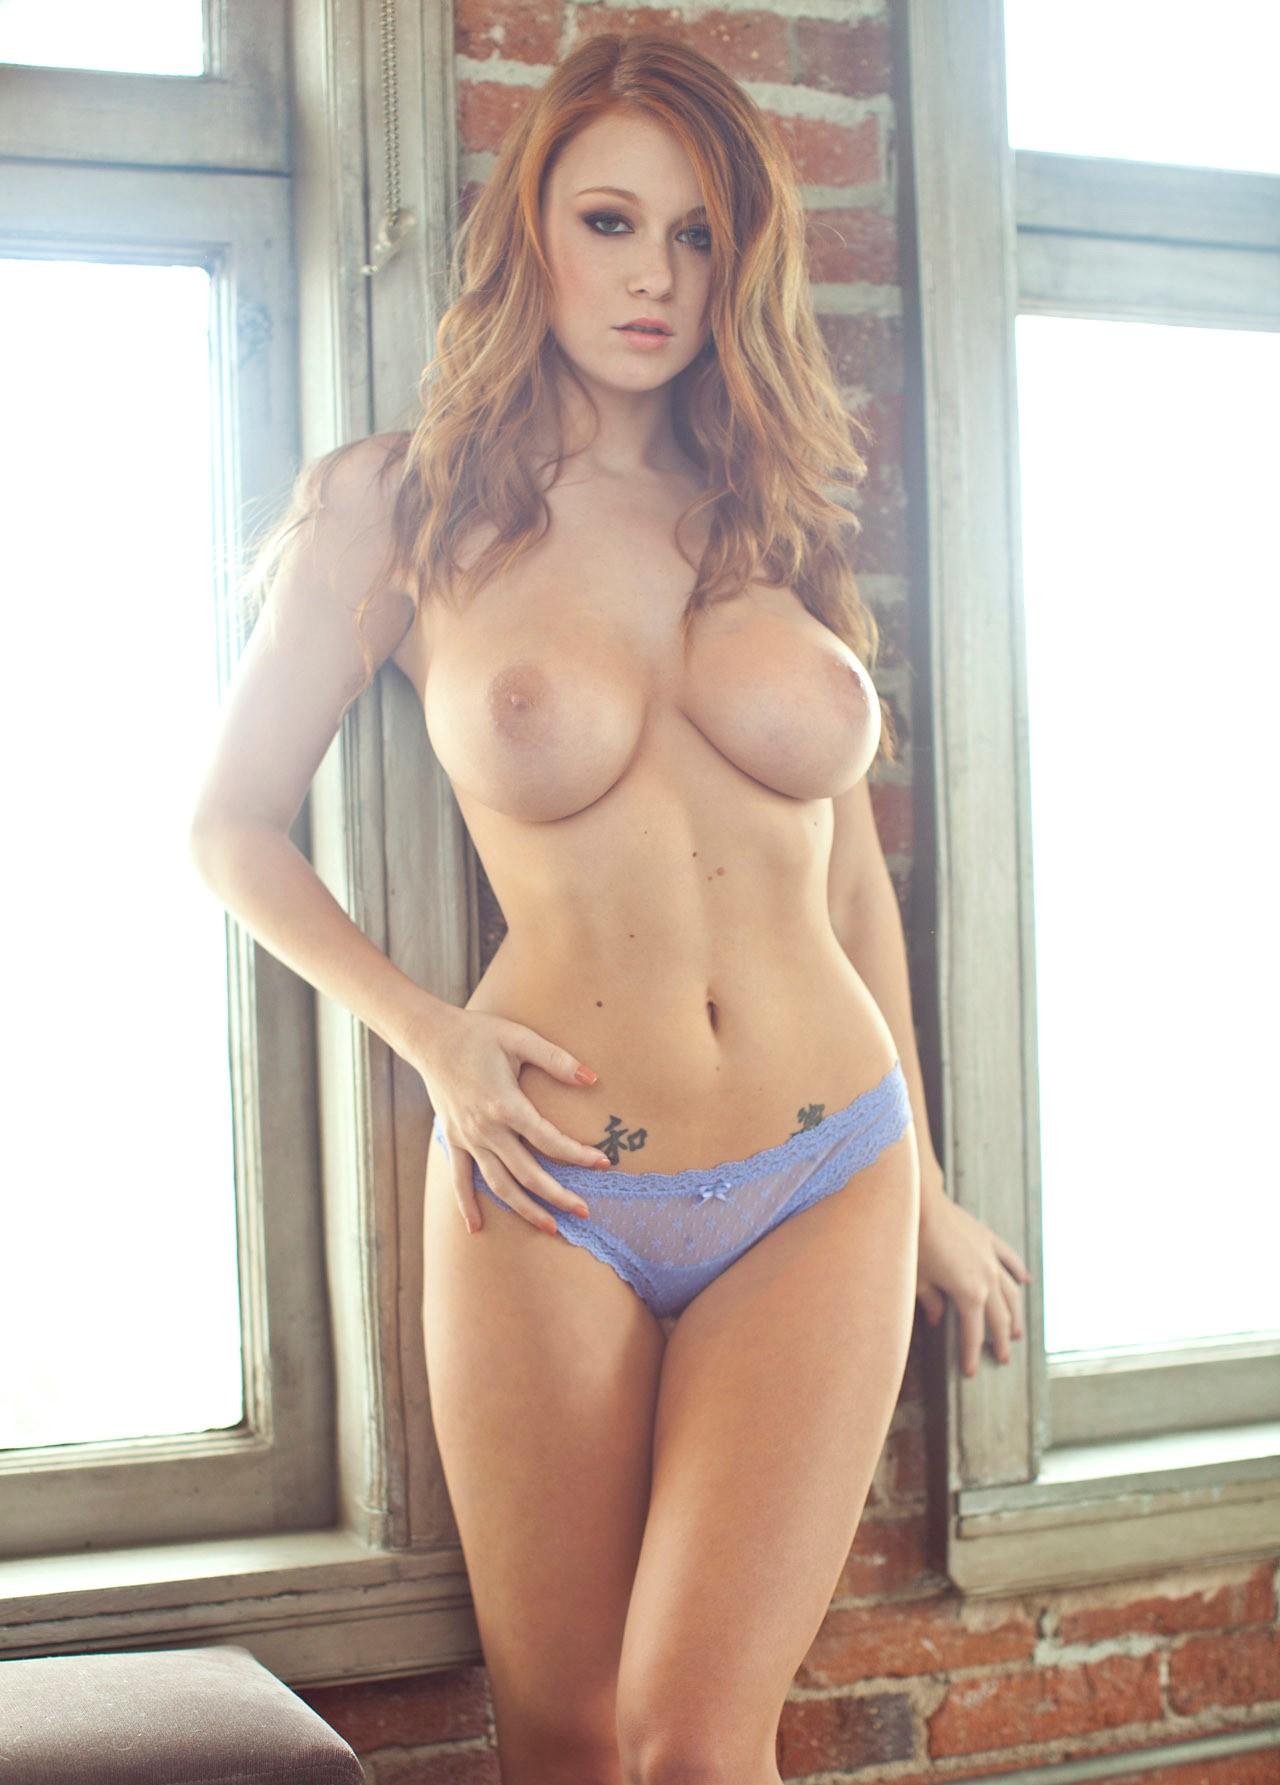 Perfect hourglass figure nude